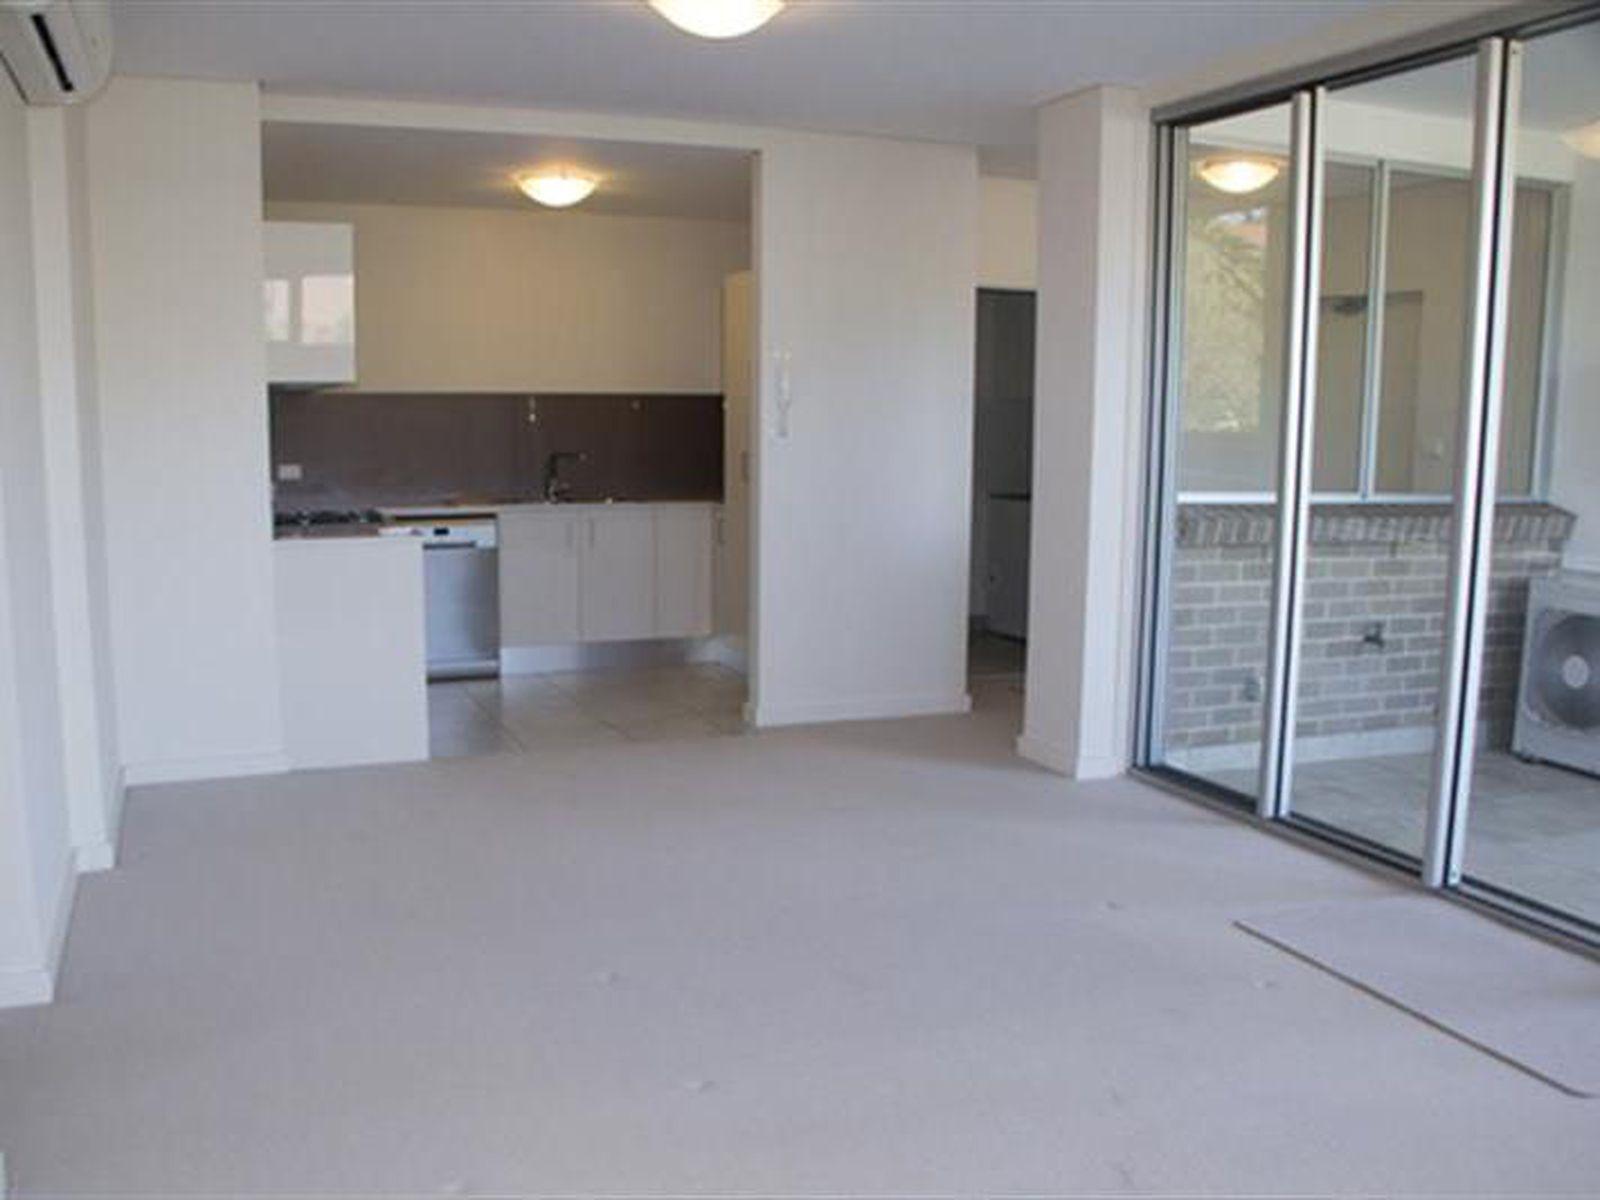 10 / 43-45 Gipps Street, Wollongong